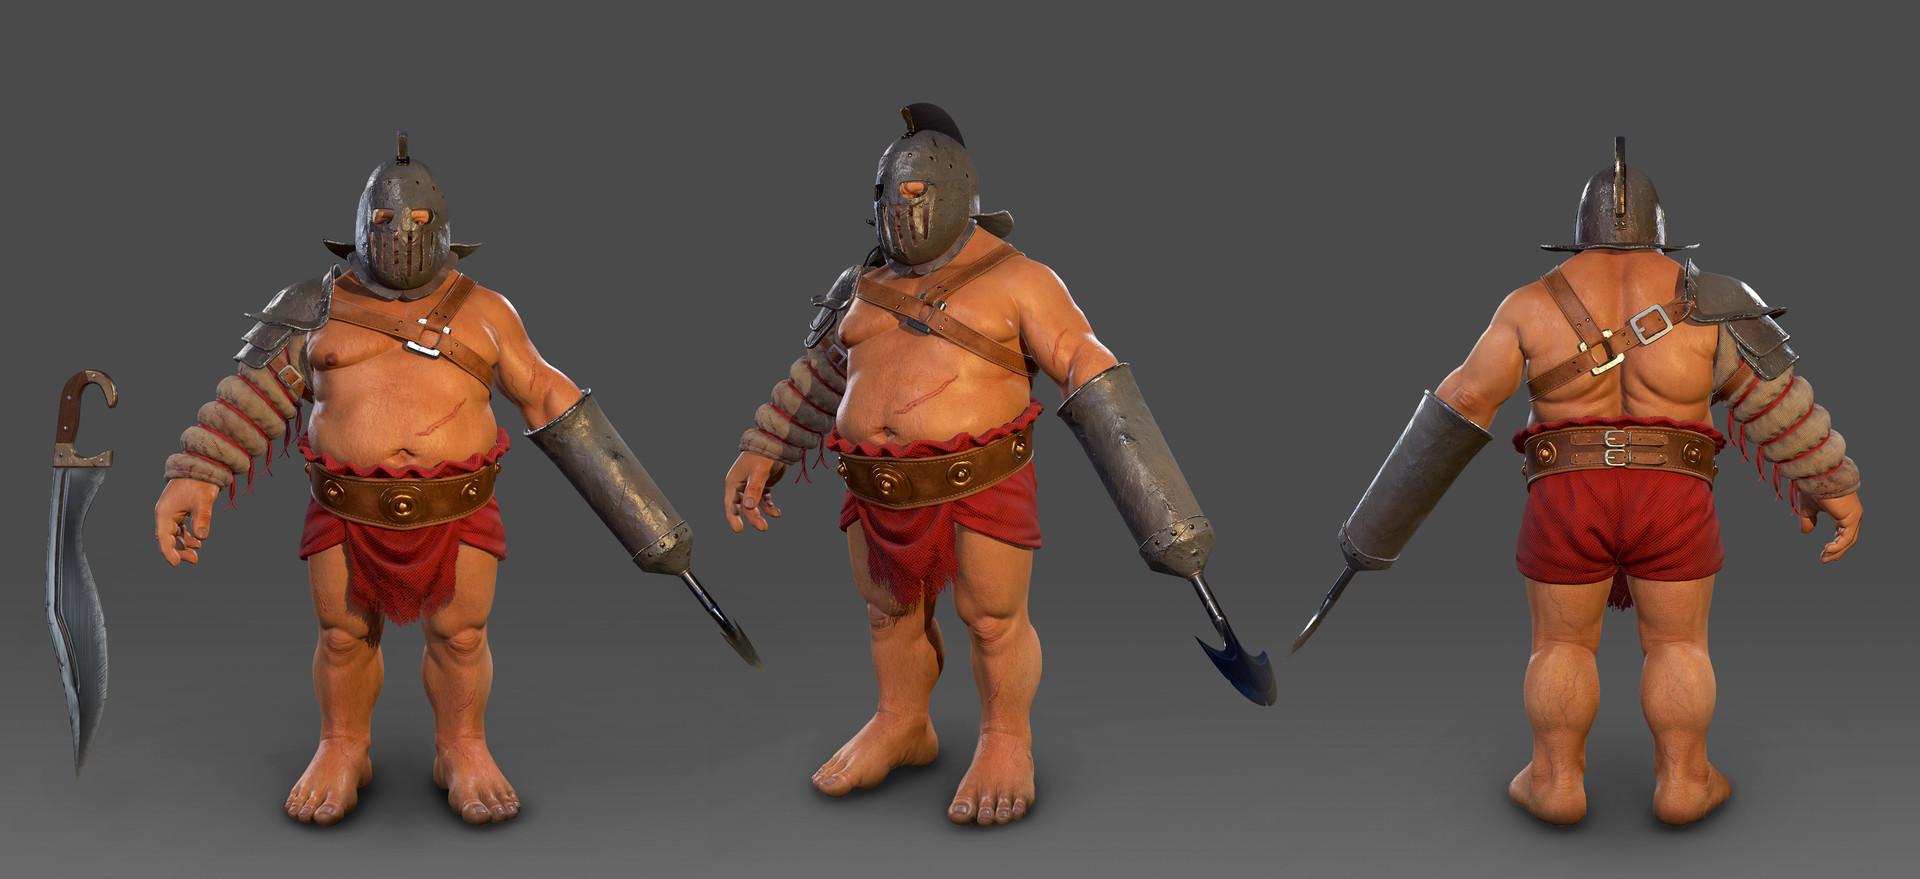 sergey-abanin-troll-gladiator-01 | 3d artist